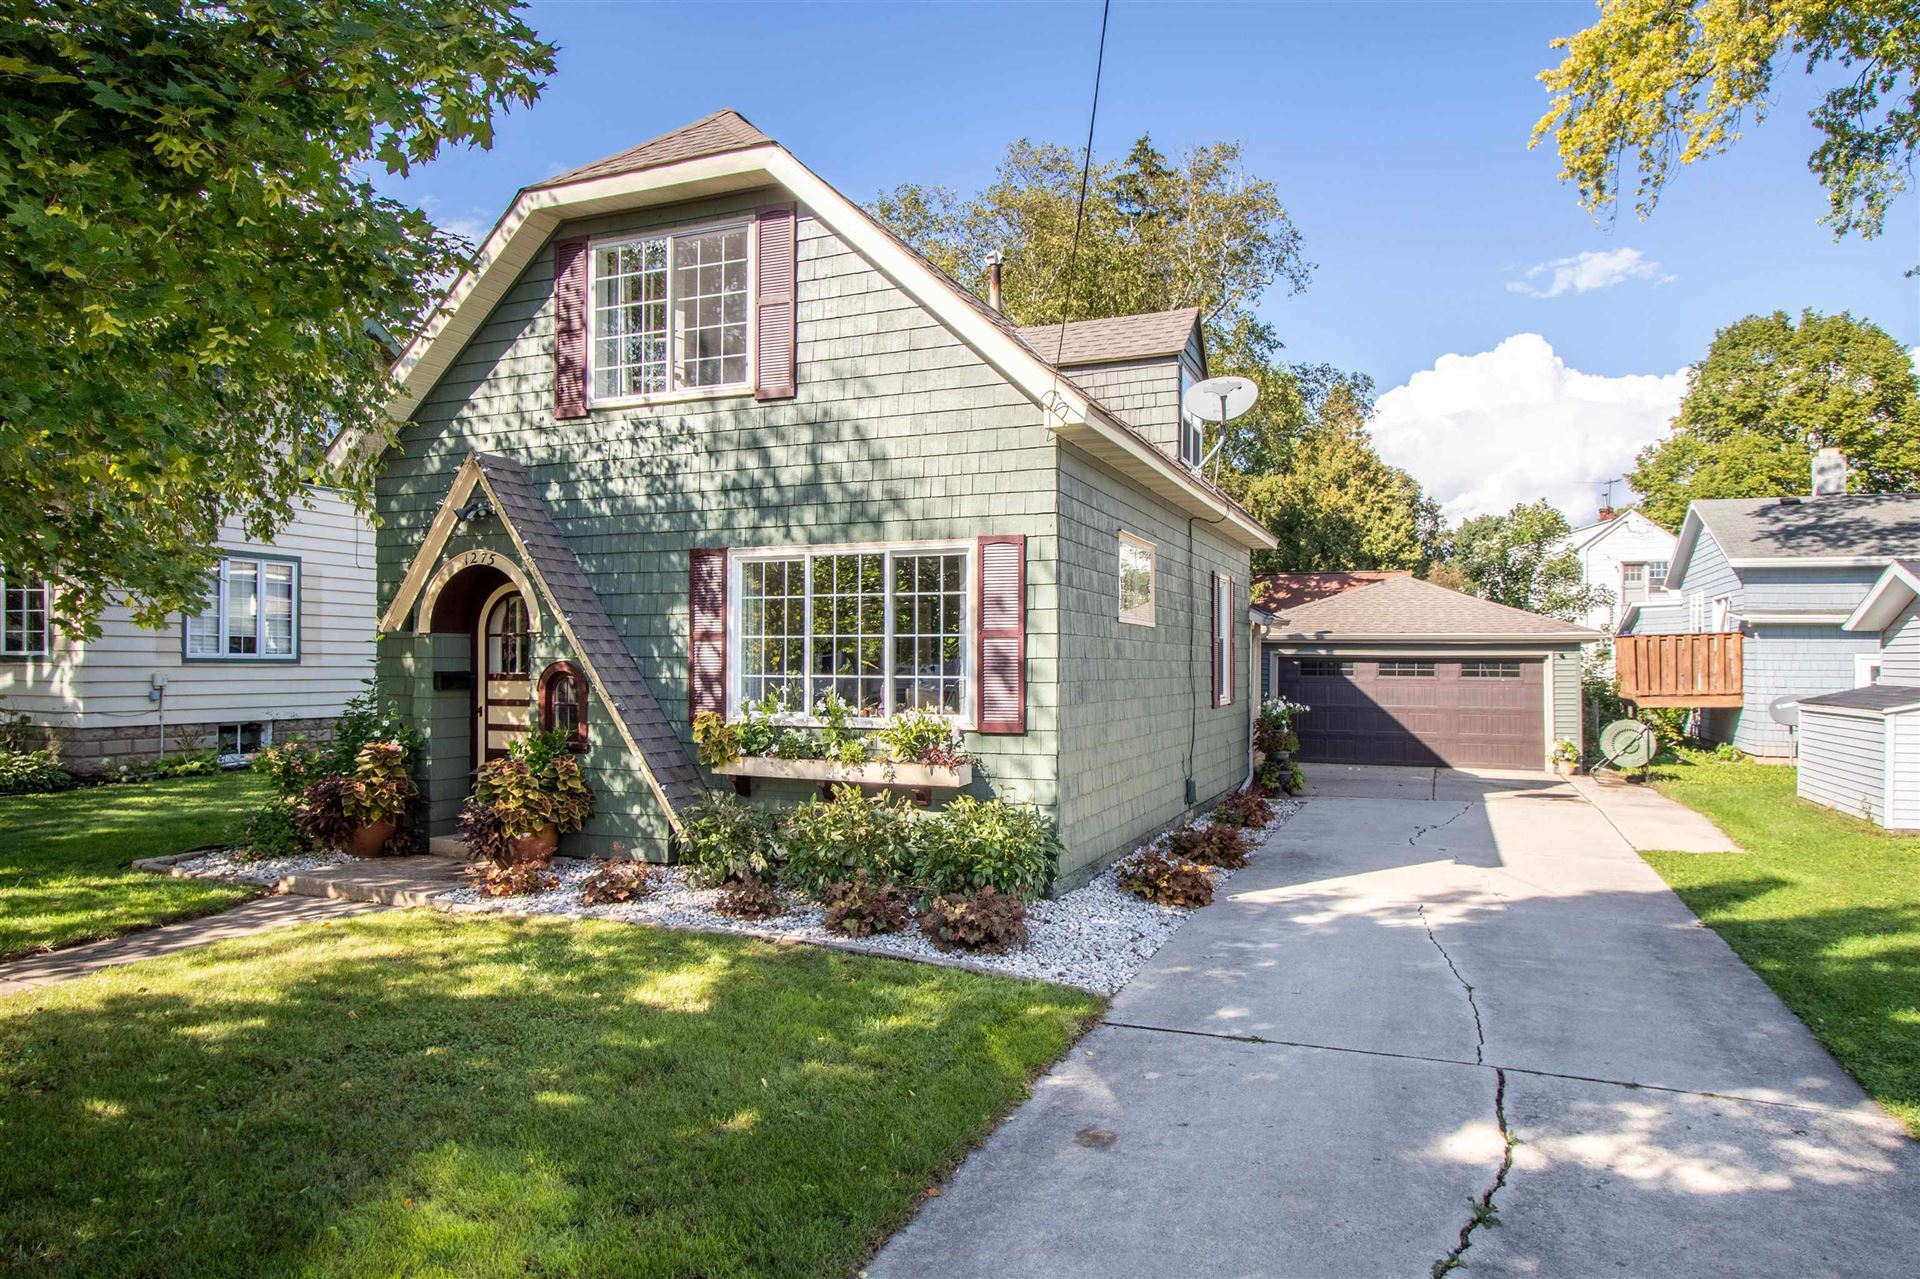 1275 PORLIER Street, Green Bay, WI 54301 - MLS#: 50247440